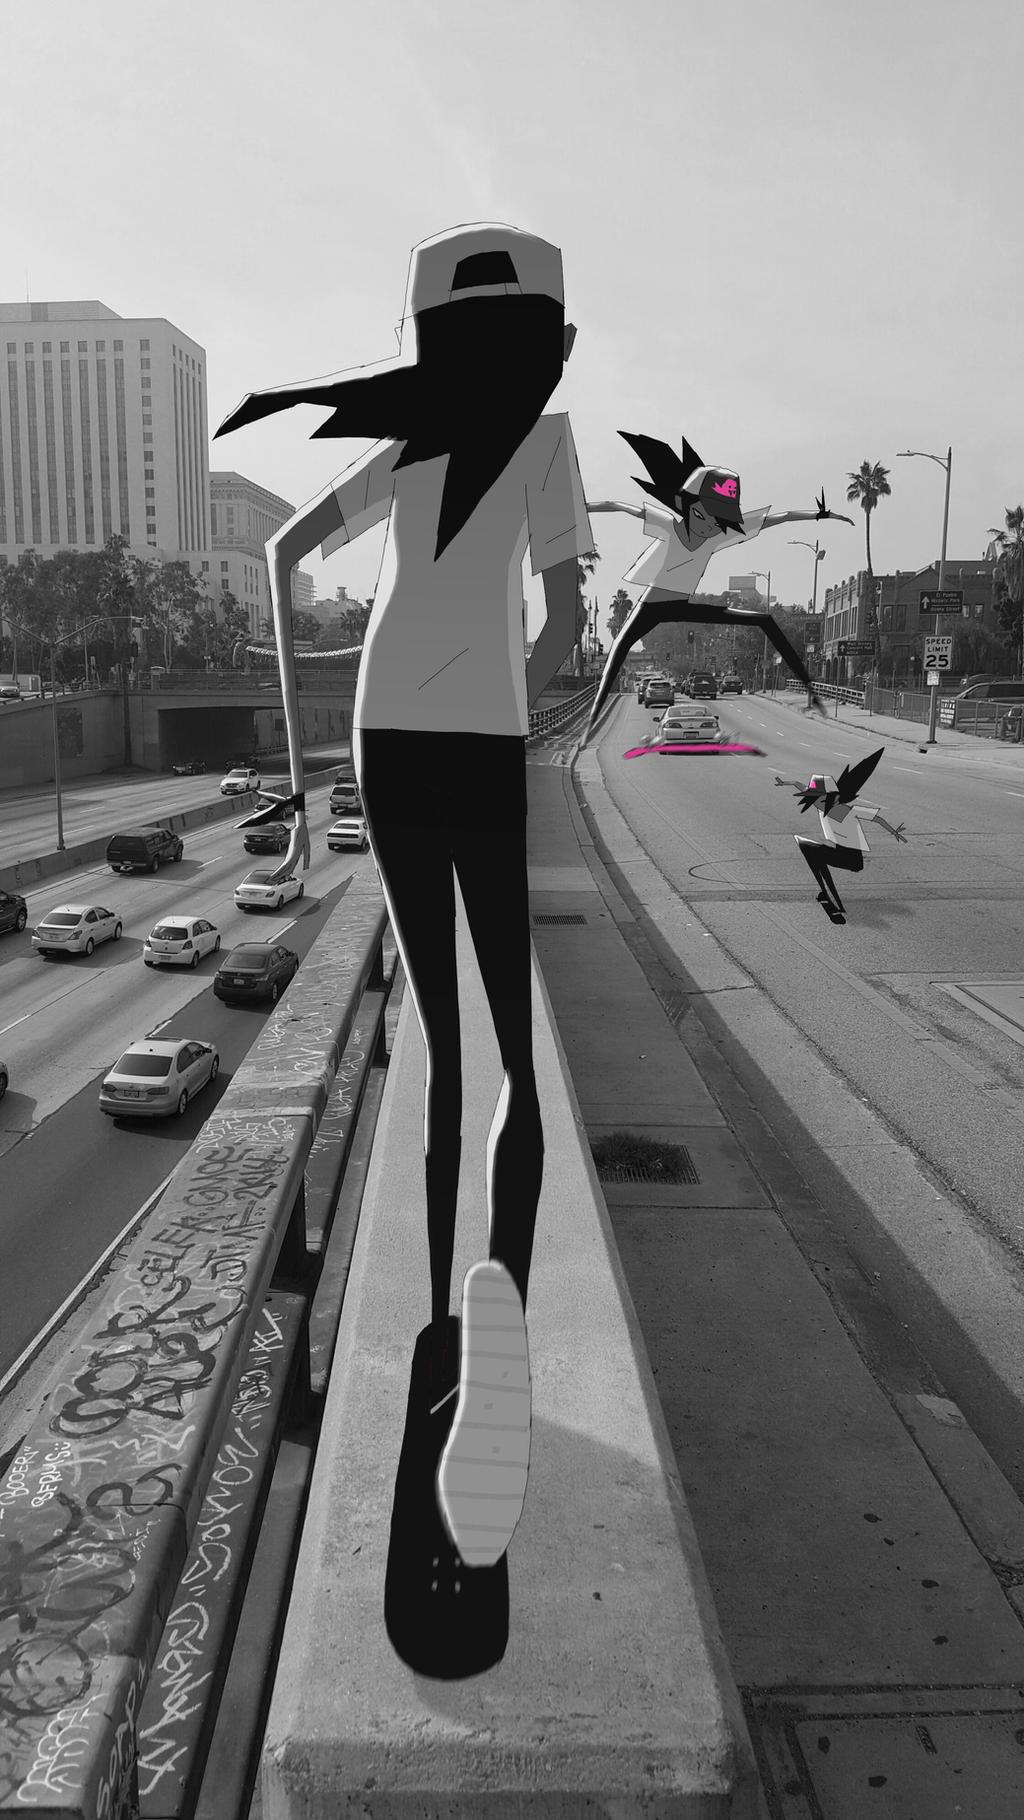 Freeway by radsechrist